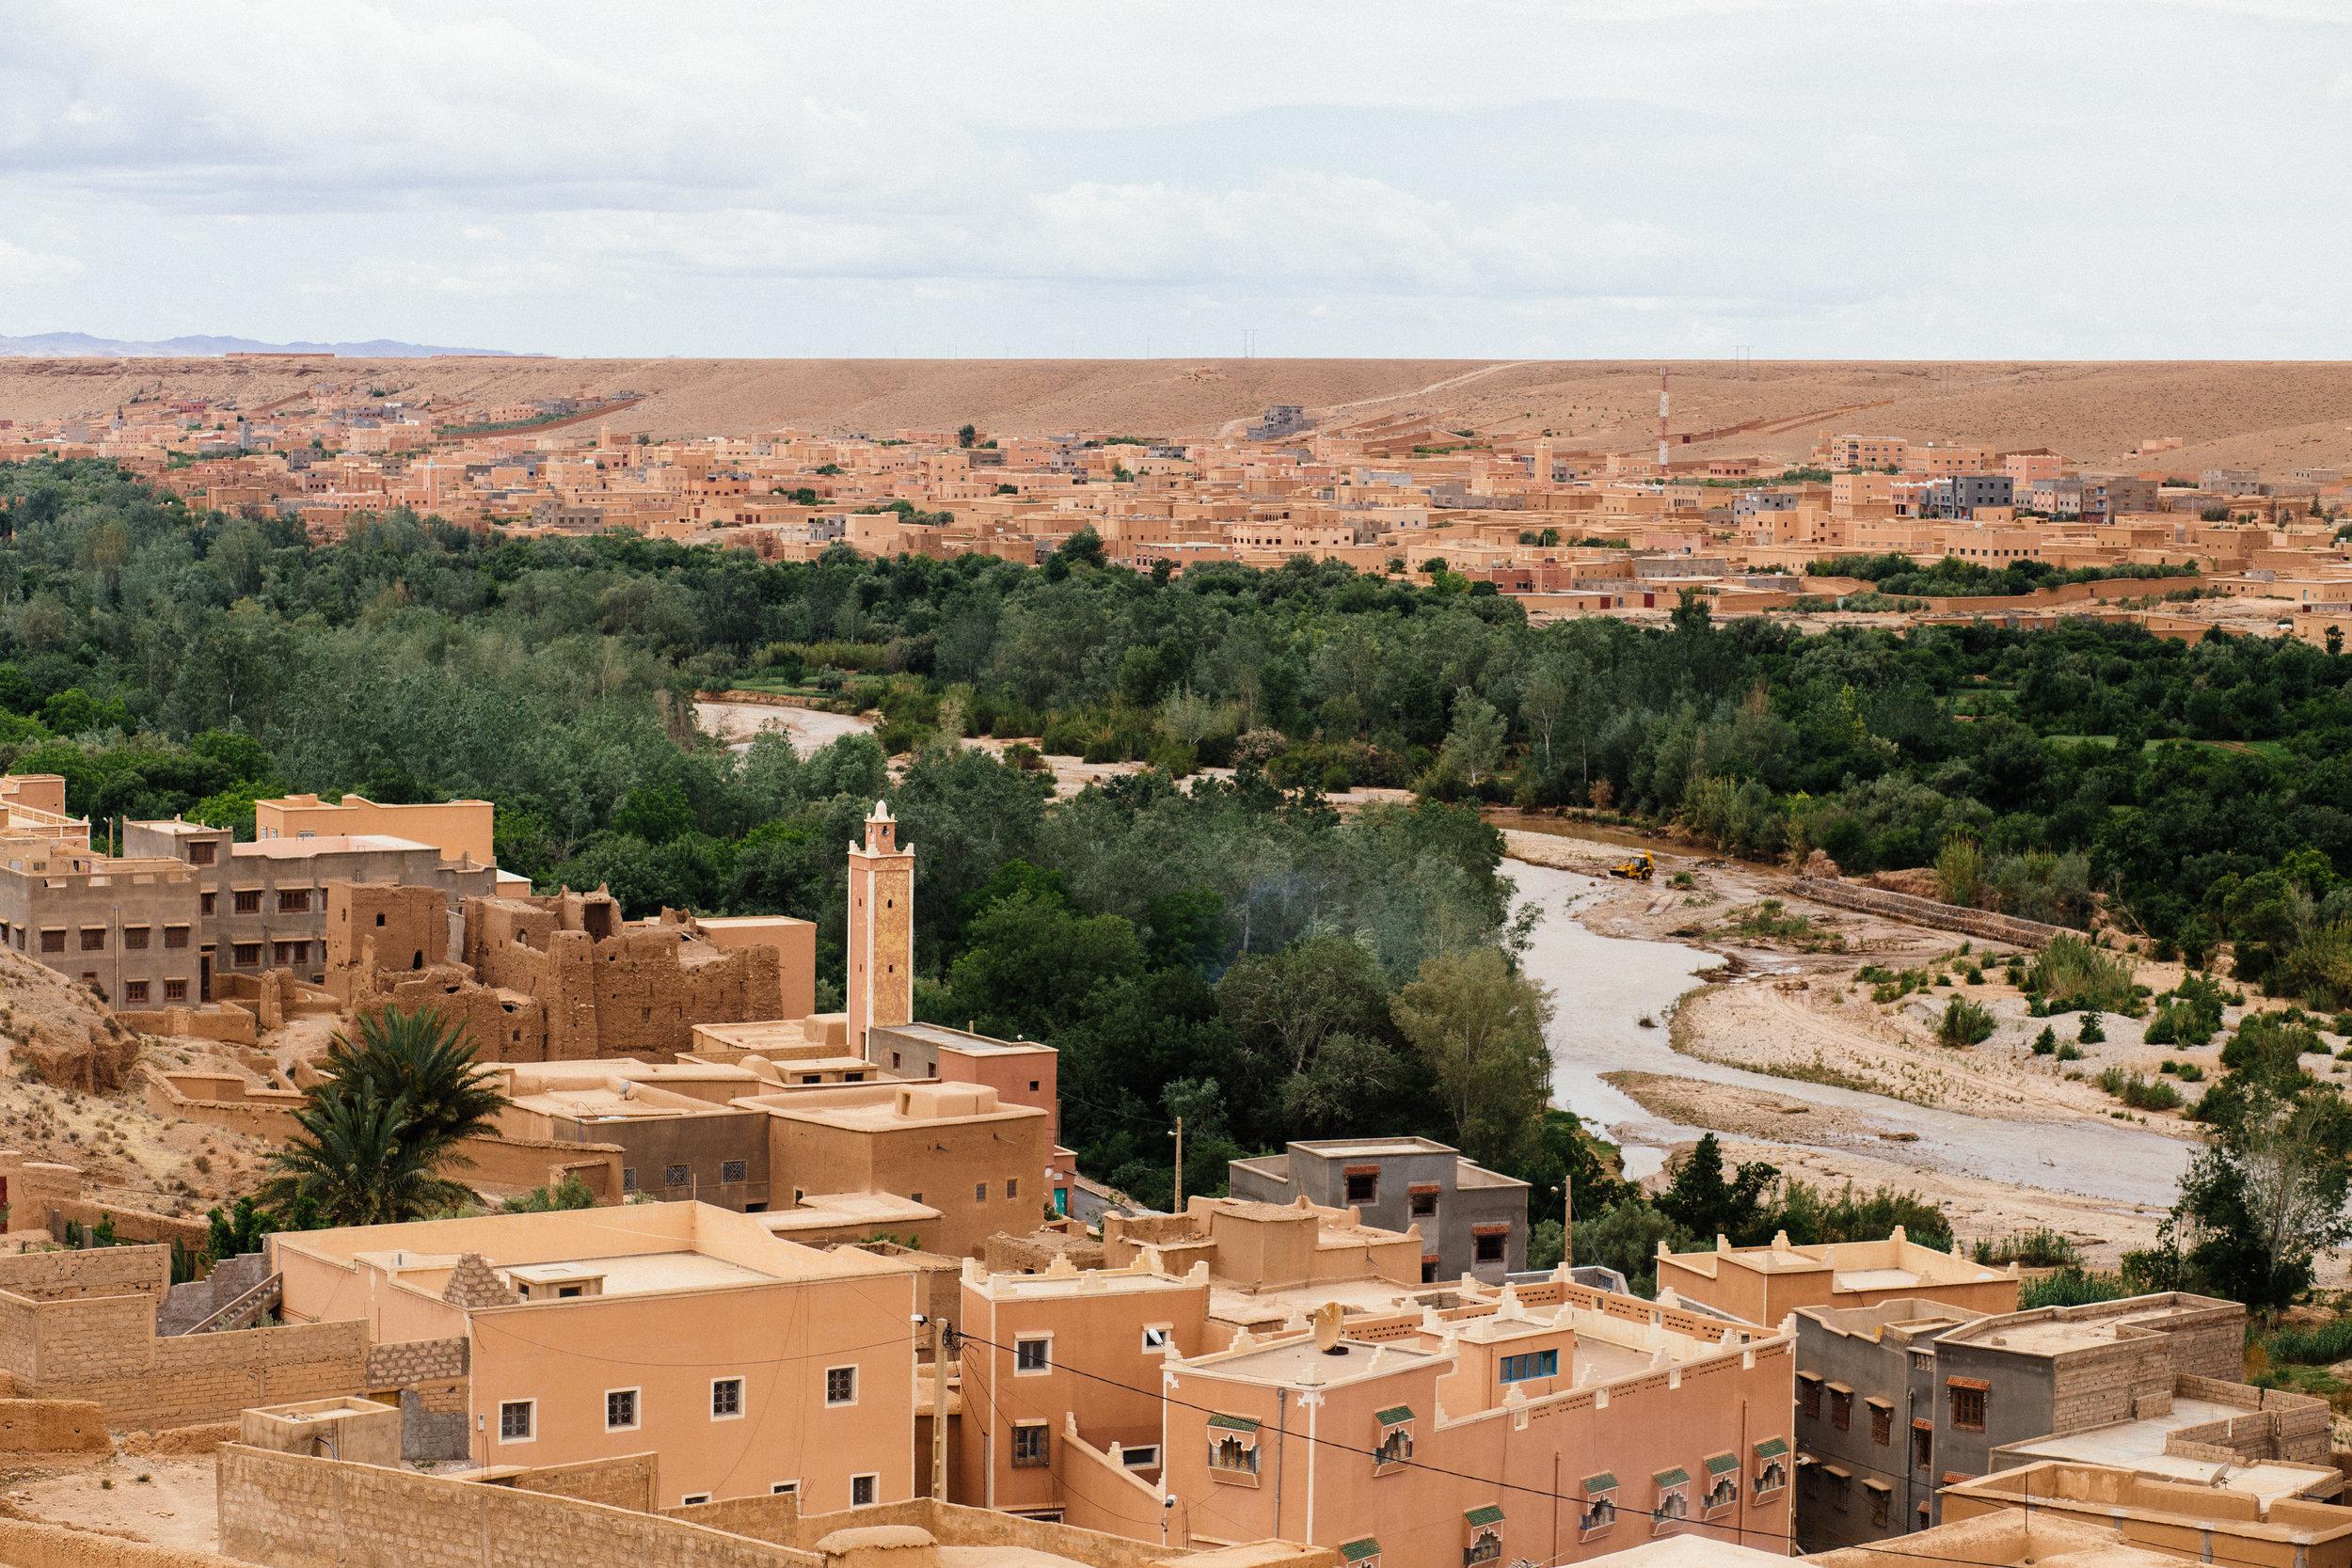 morocco-morocco travel-visit morocco-travel-travel photography-travel photographer-alina mendoza-alina mendoza photography-119.jpg